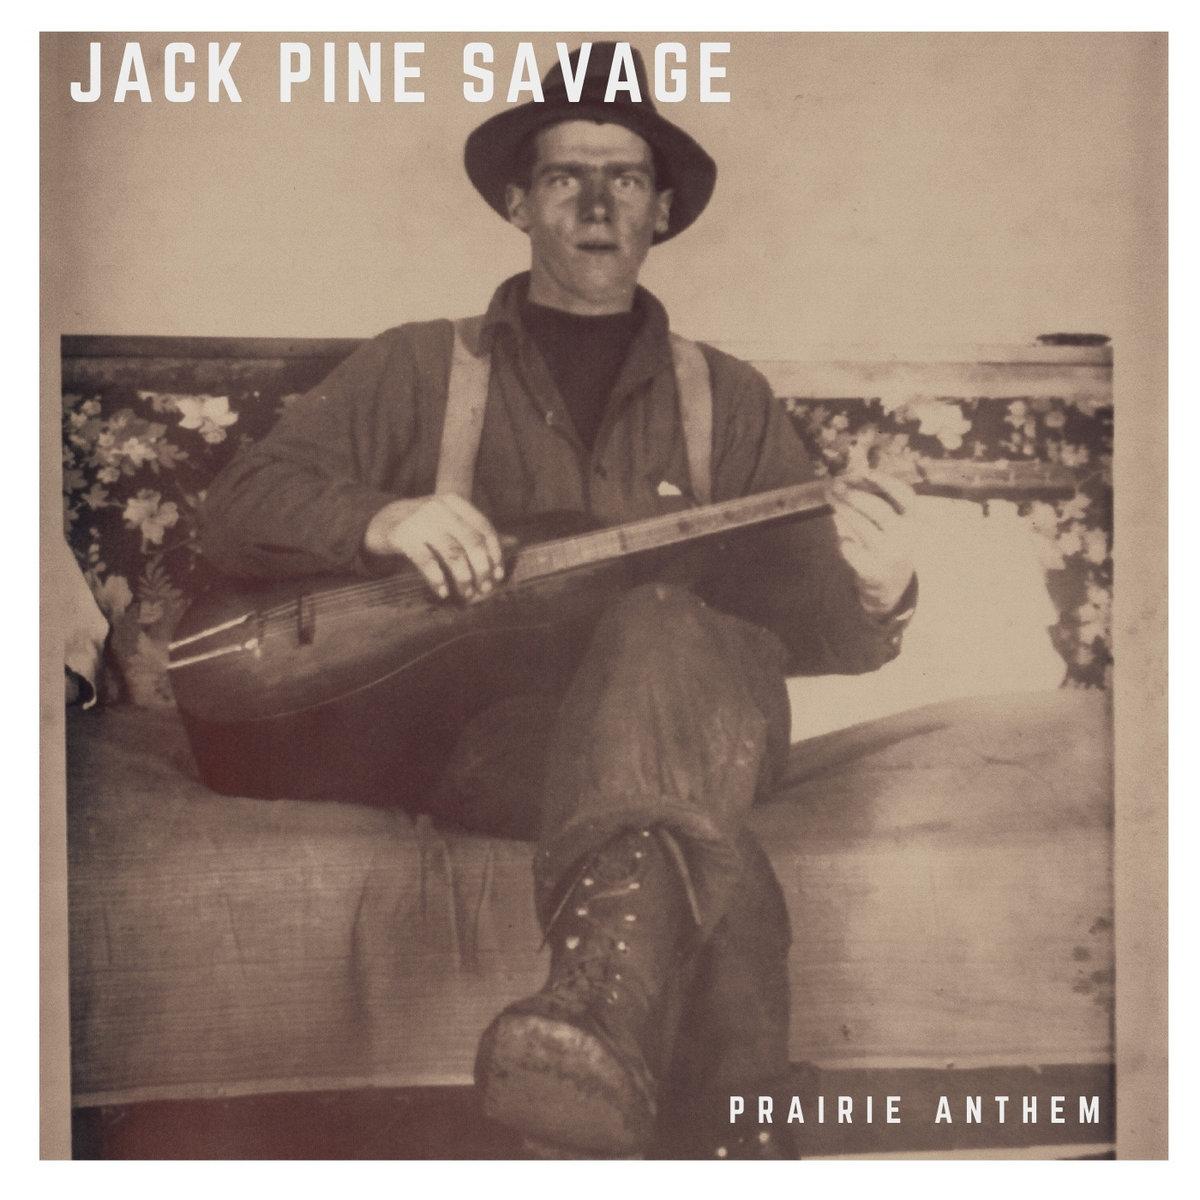 Jack Pine Savage by Prairie Anthem